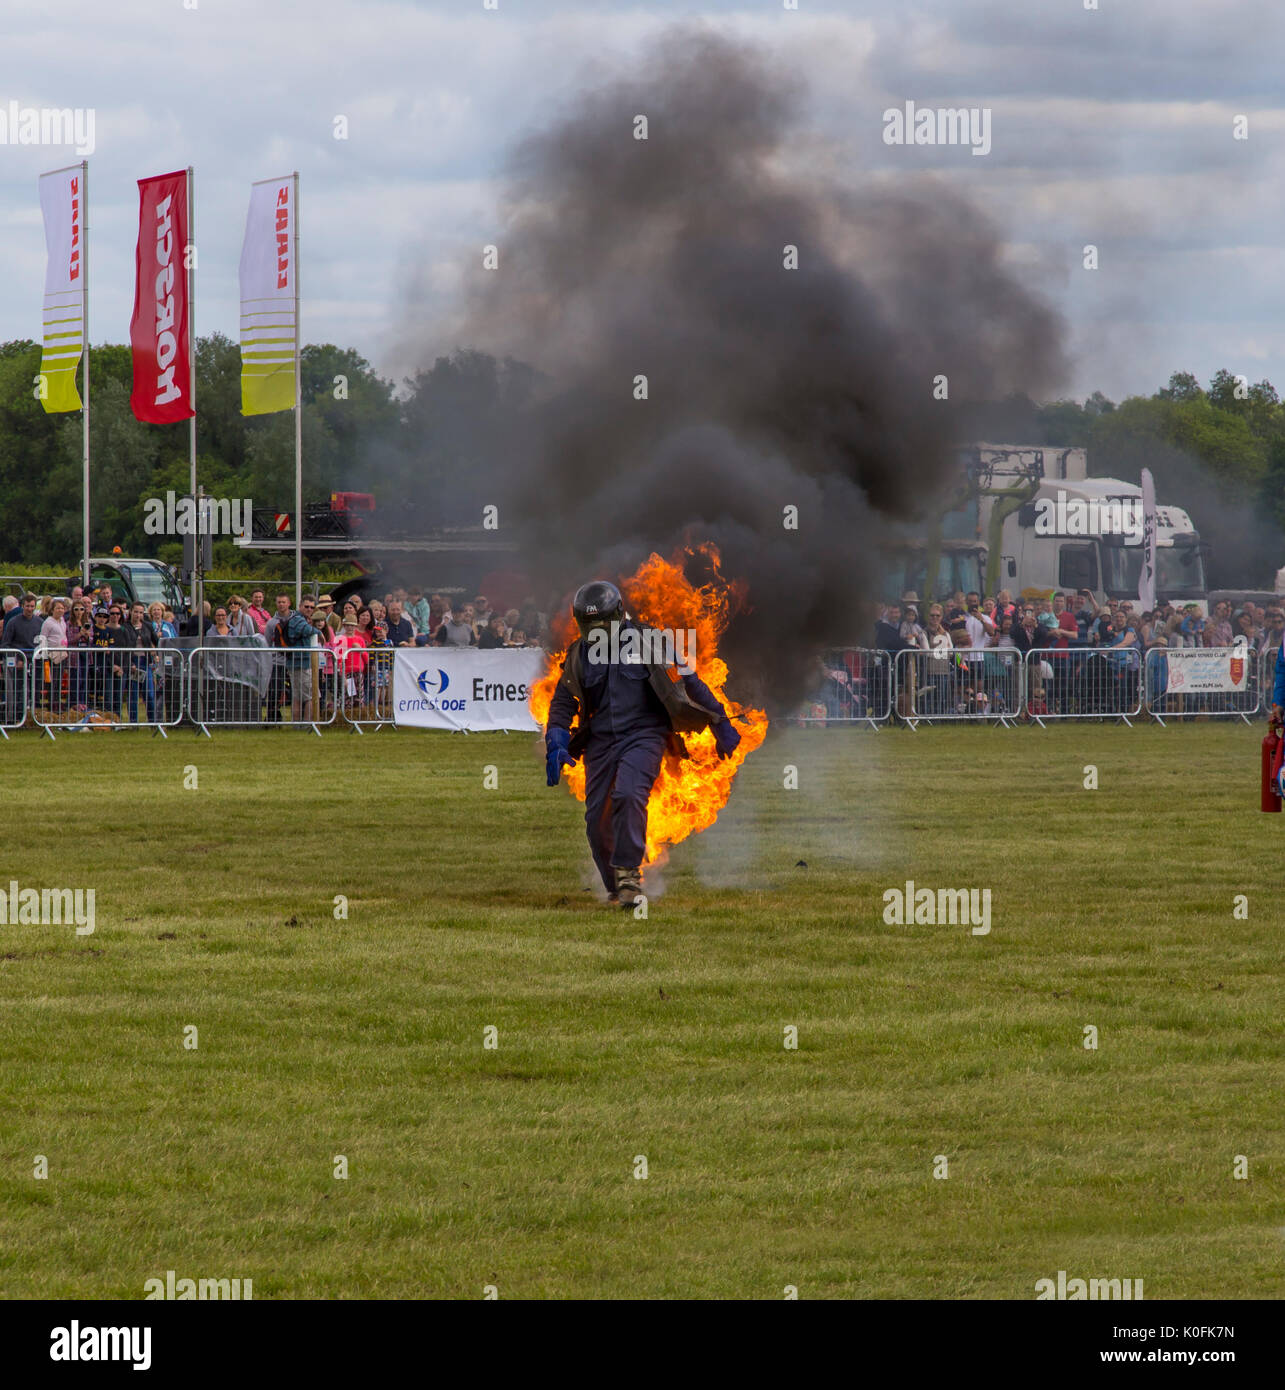 Stunt man on fire - Stock Image